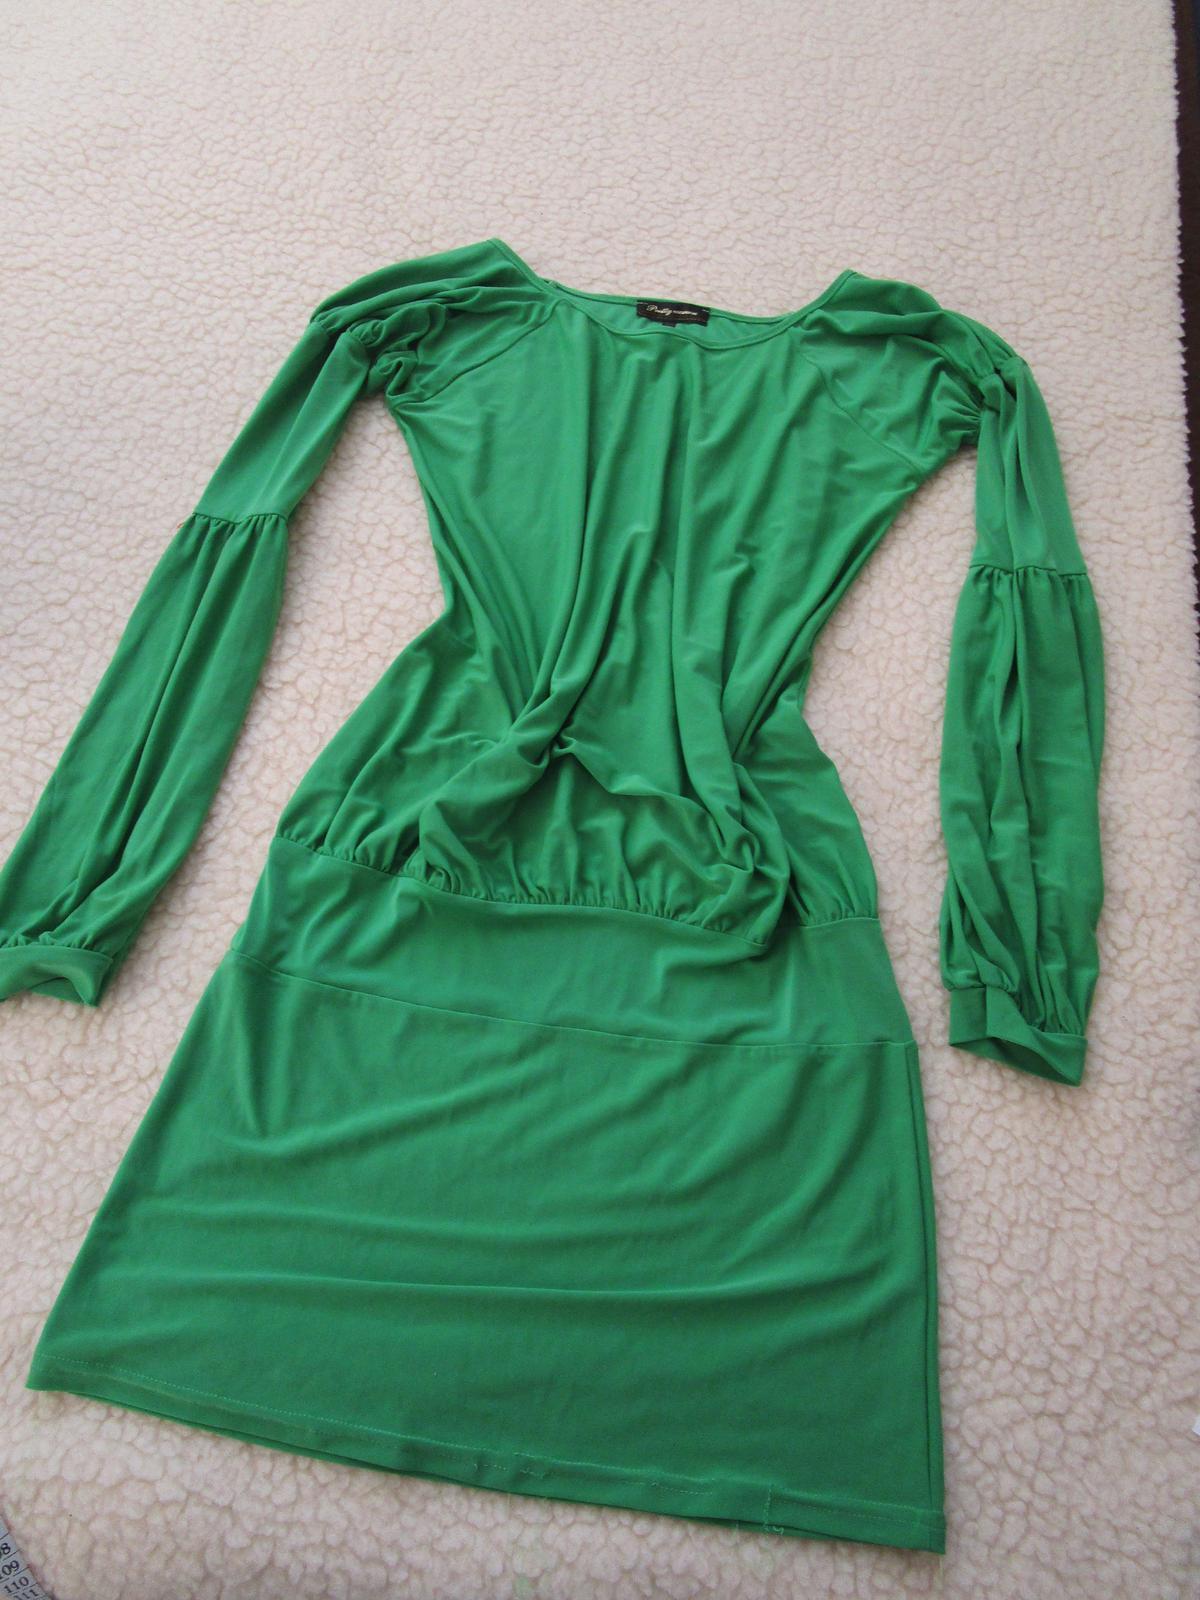 2105. šaty - Obrázok č. 3